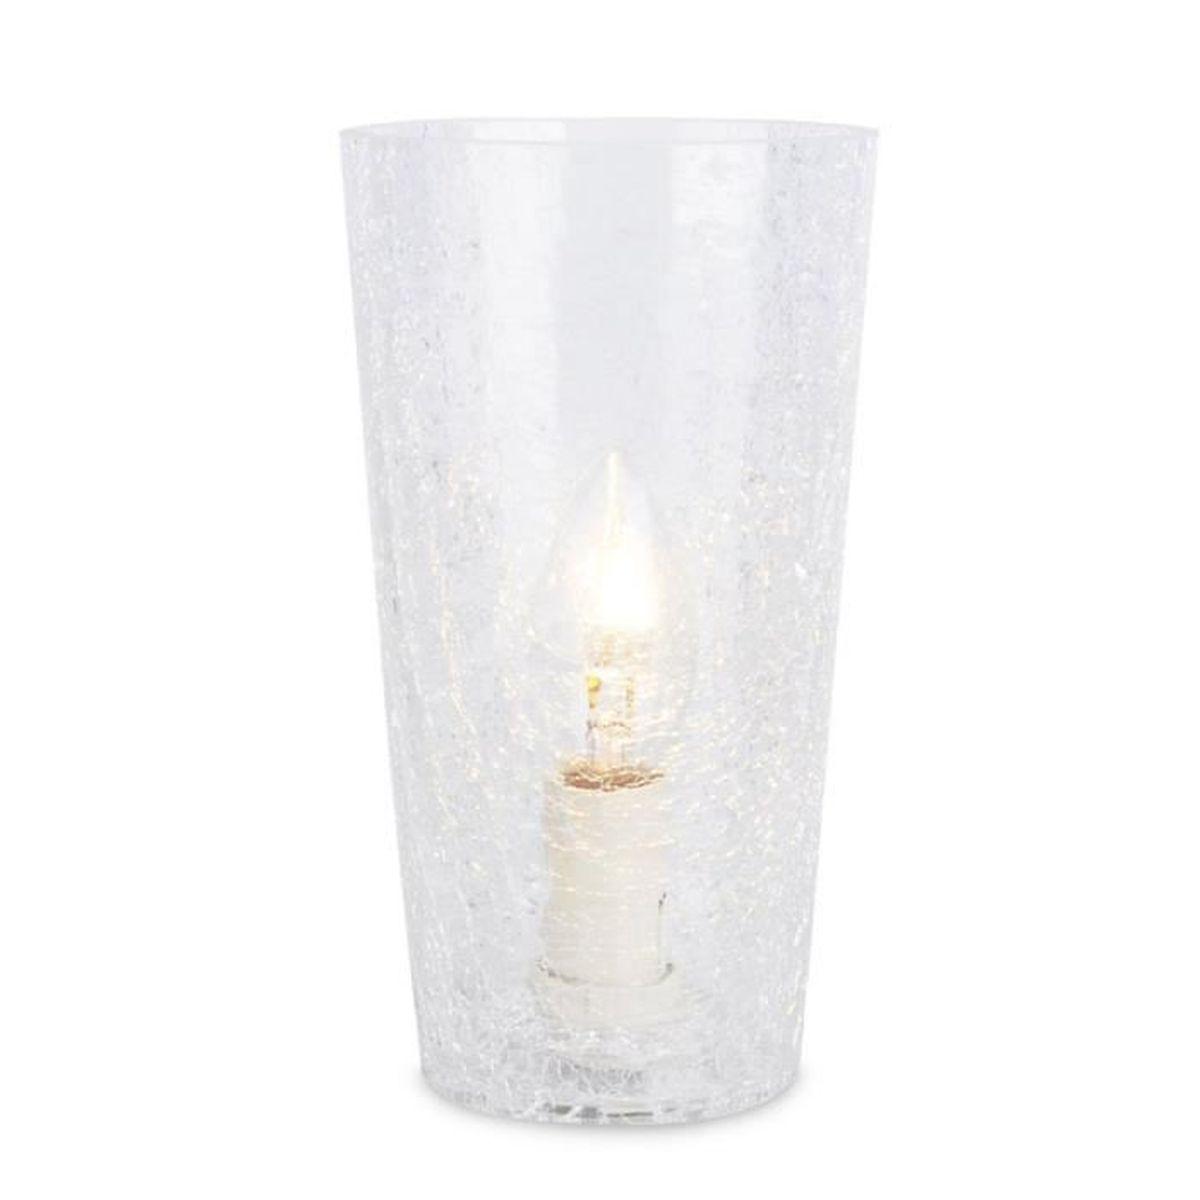 Lampe de table ou chevet rhona cylindre en verre effet for Verre pour lampe de chevet